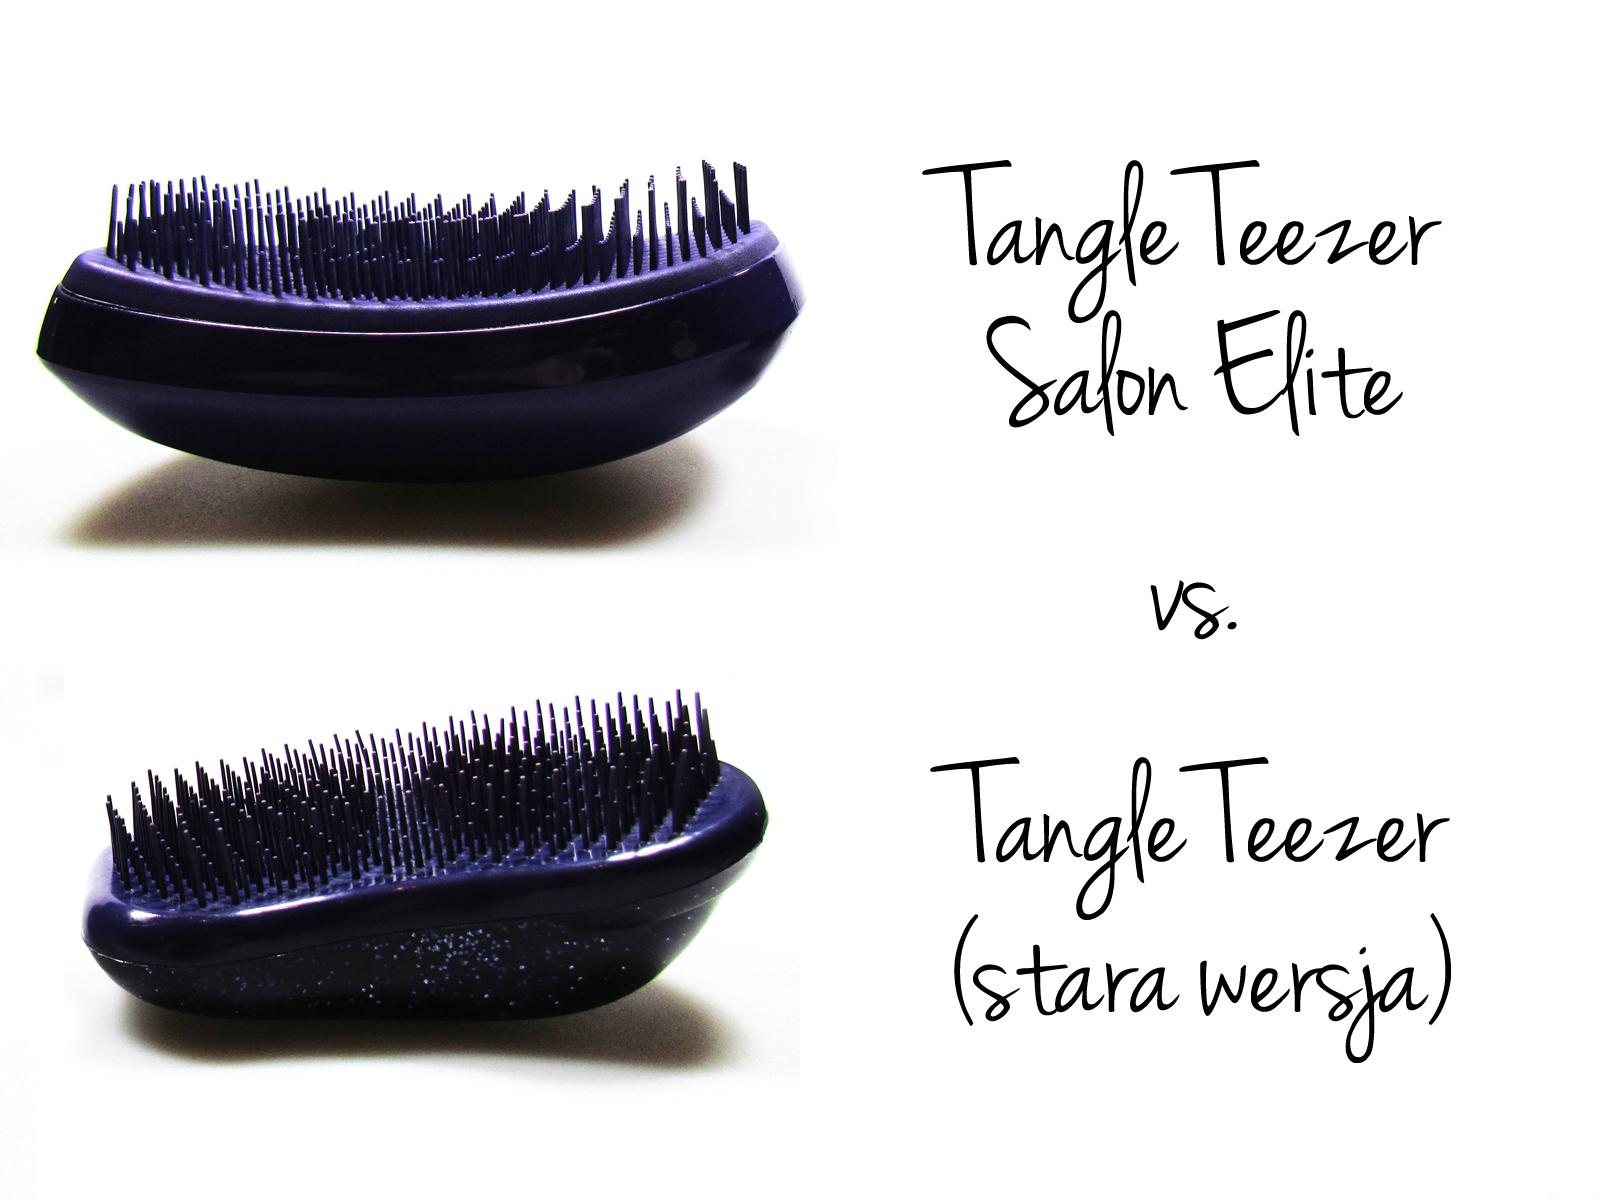 TANGLE TEEZER SALON ELITE VS. TANGLE TEEZER